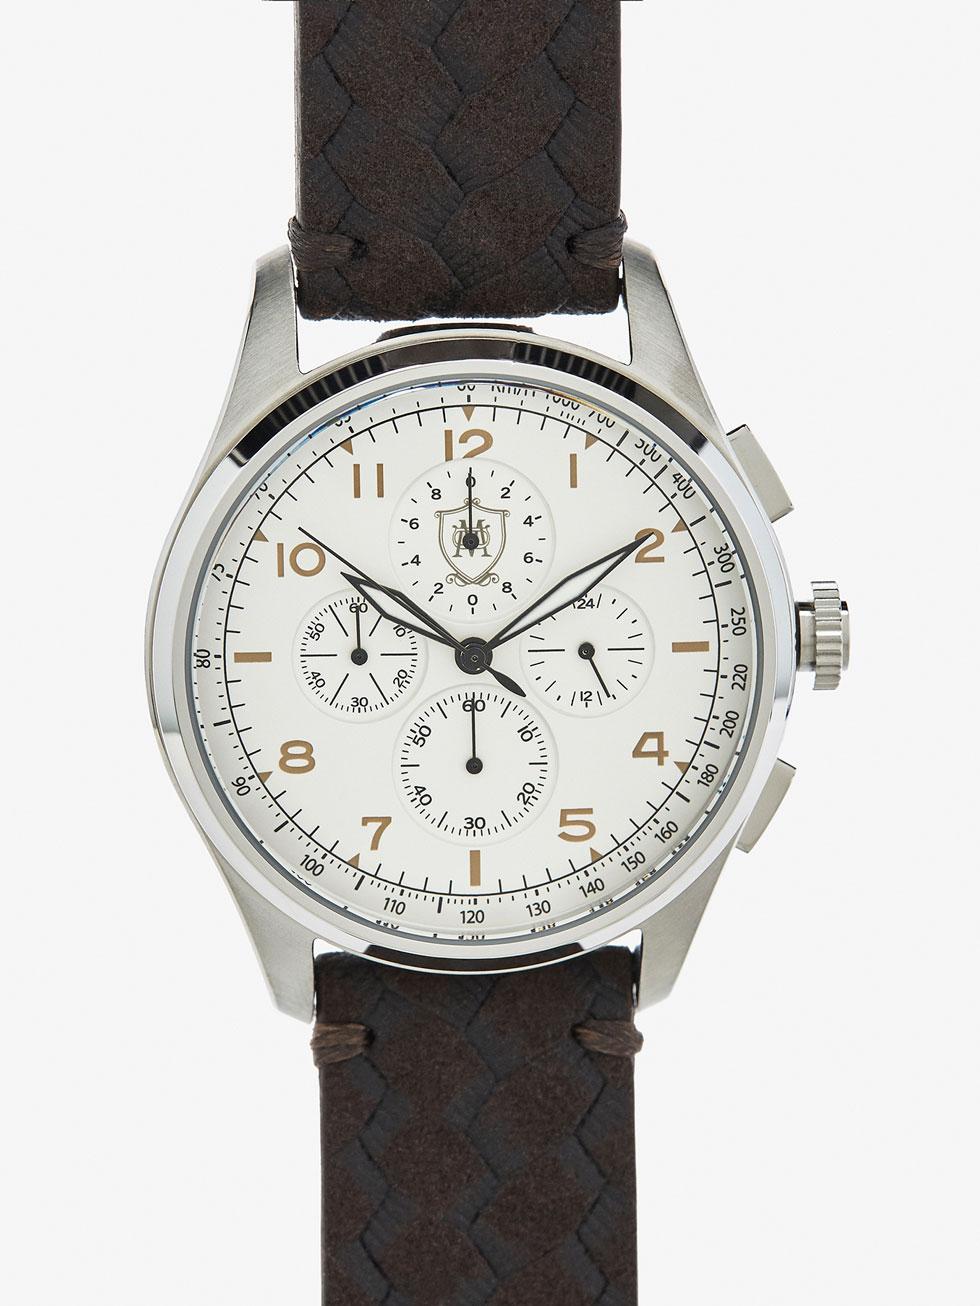 Lo ultimo en relojes masculinos de Massimo Dutti 4